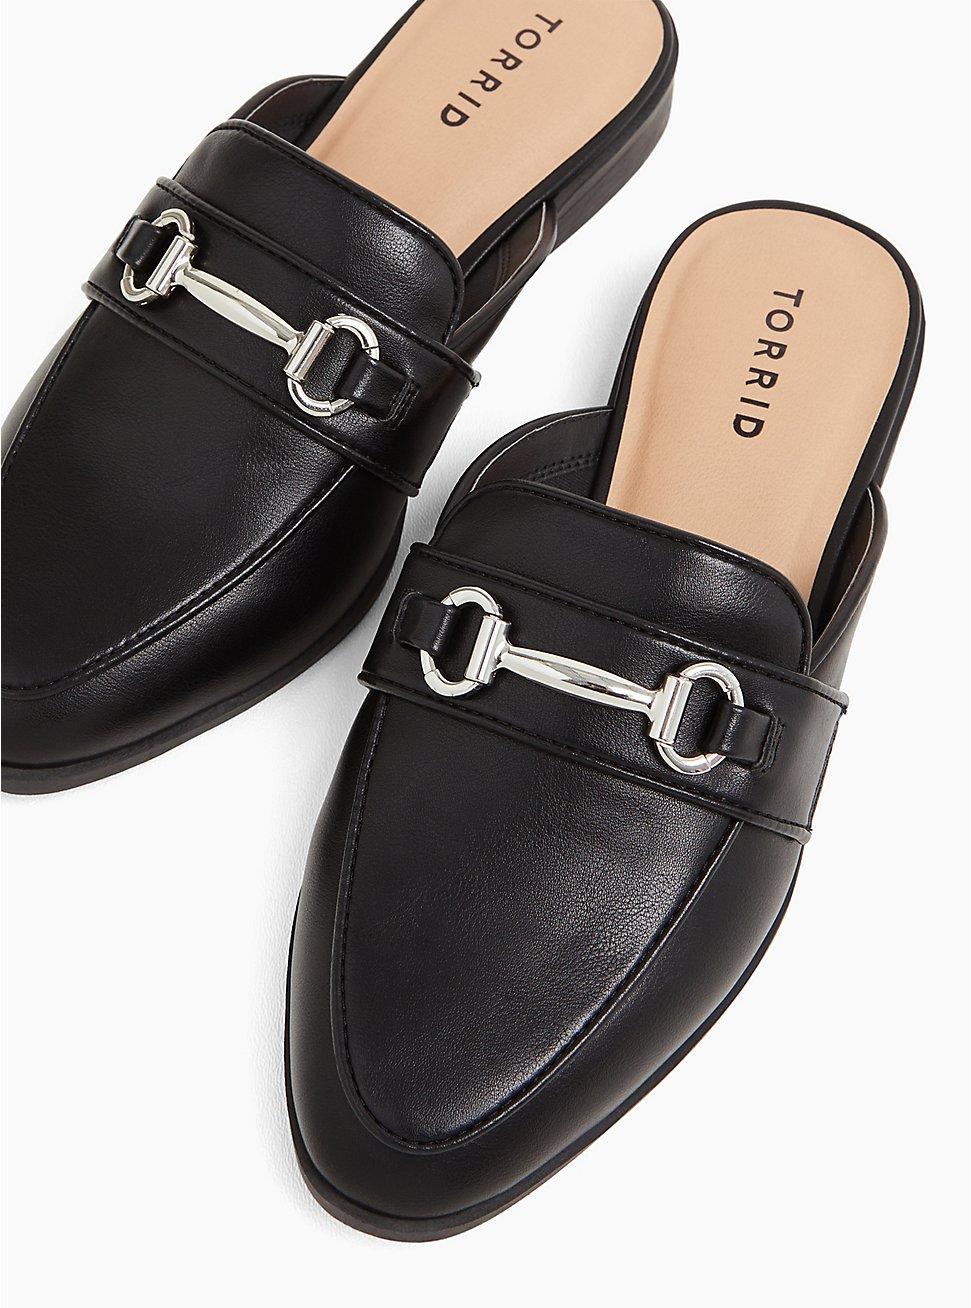 Black Faux Leather Loafer Mule (WW), BLACK, hi-res